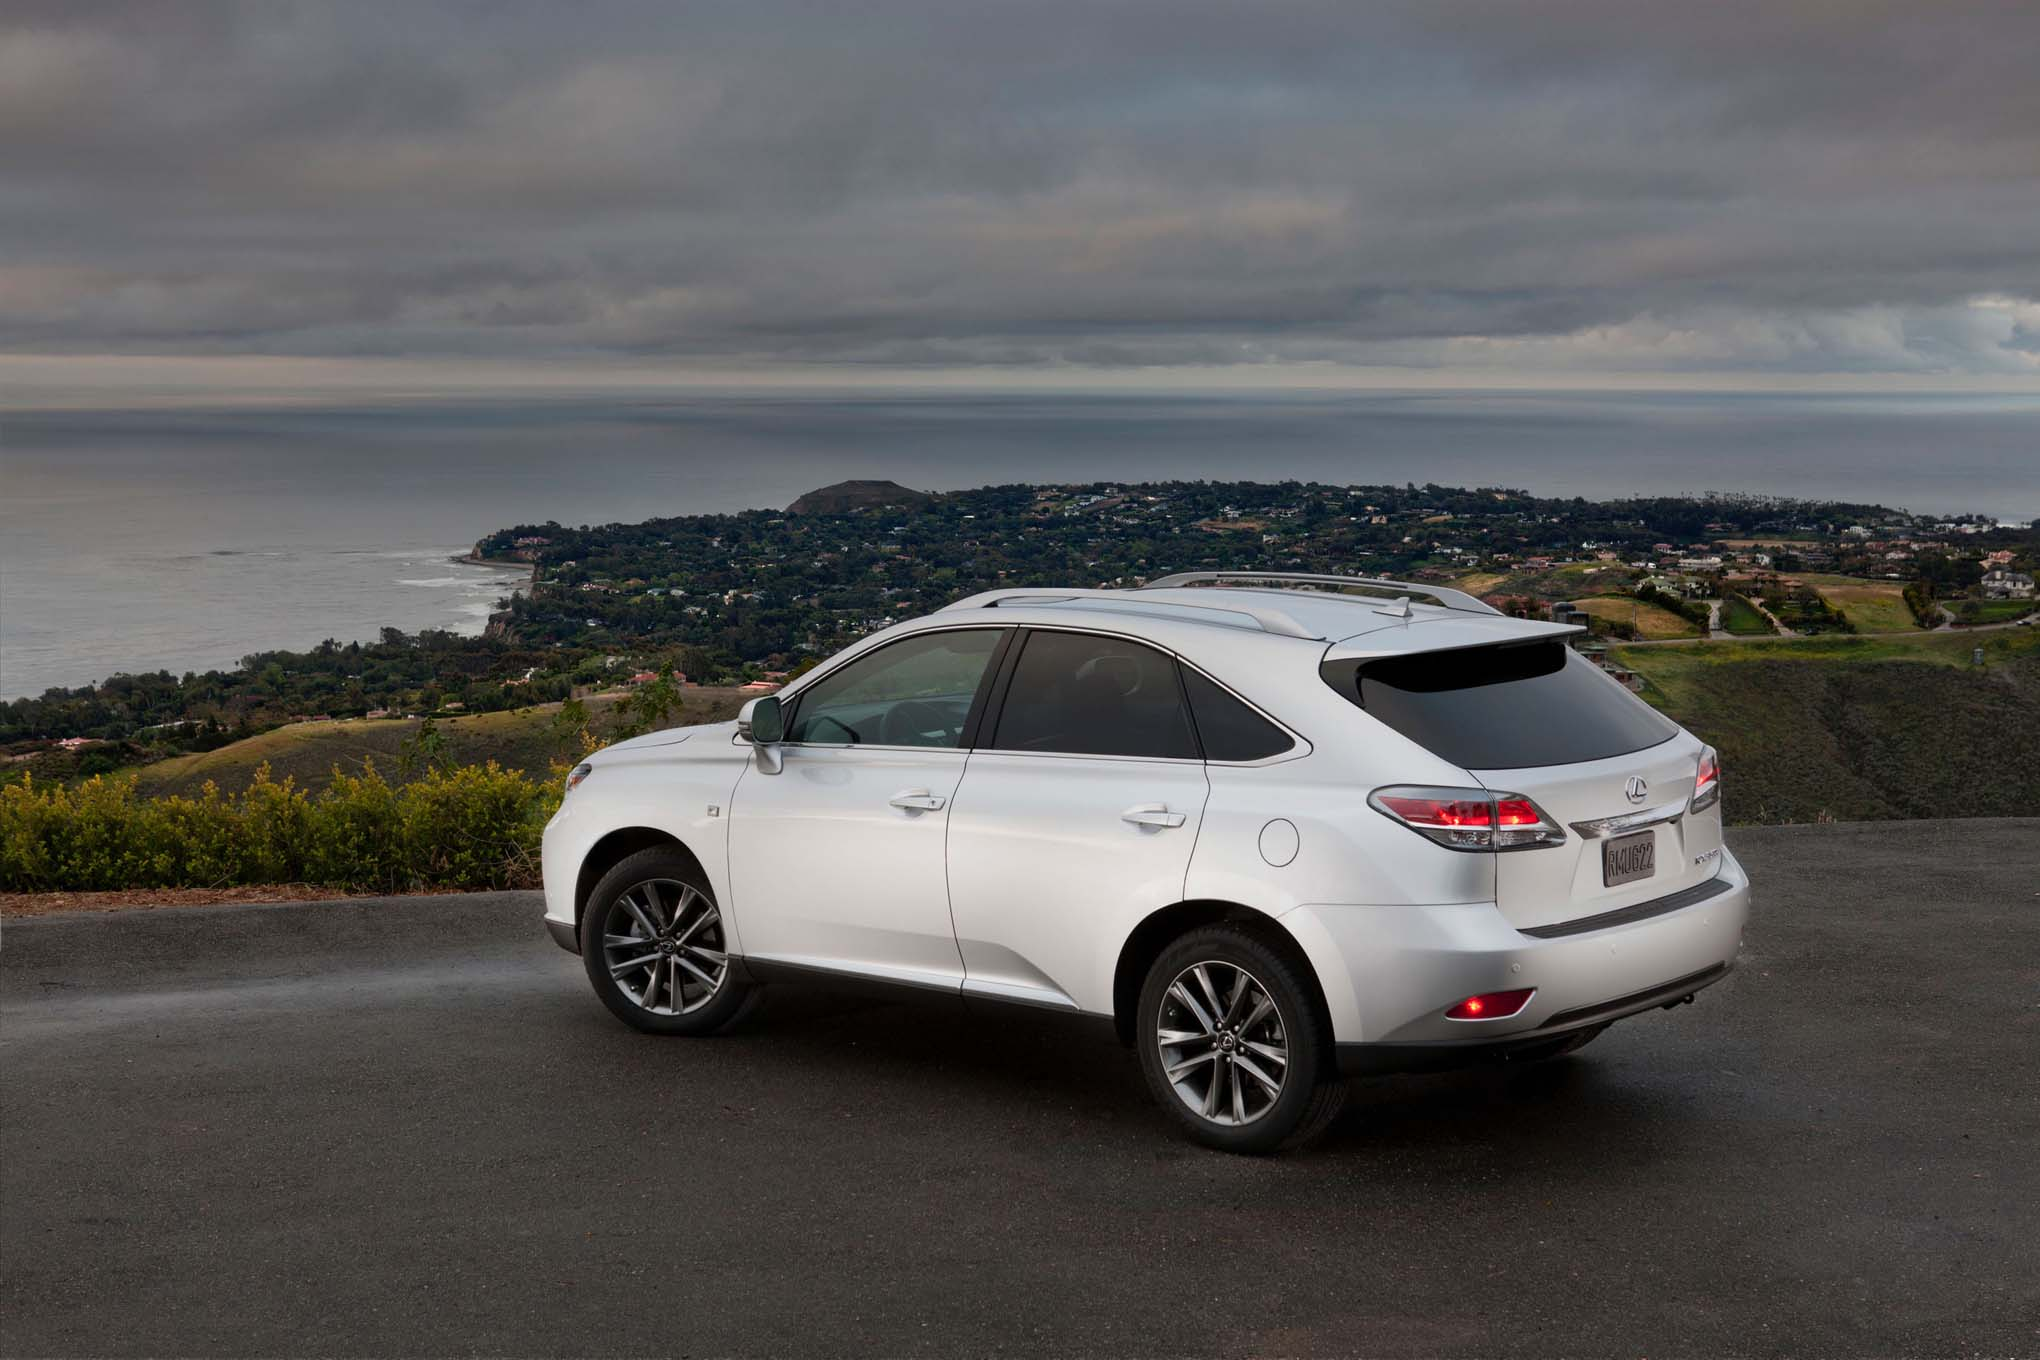 Recalls 2014 2015 Toyota Models 2015 Lincoln MKC GM CNG